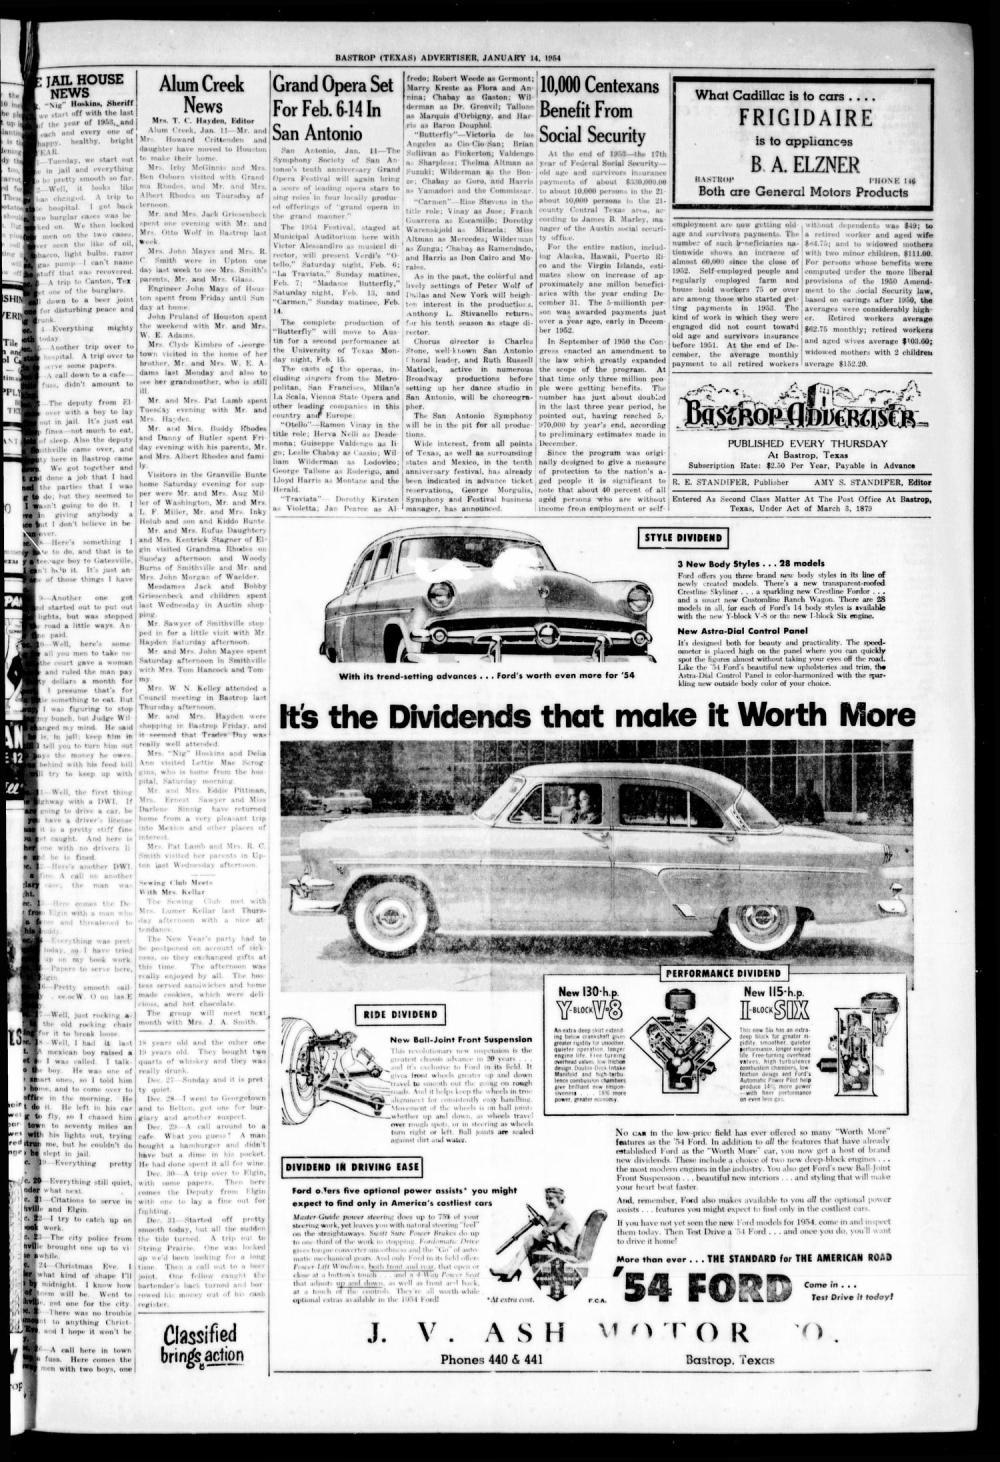 medium resolution of bastrop advertiser bastrop tex vol 101 no 46 ed 1 thursday january 14 1954 page 3 of 8 the portal to texas history